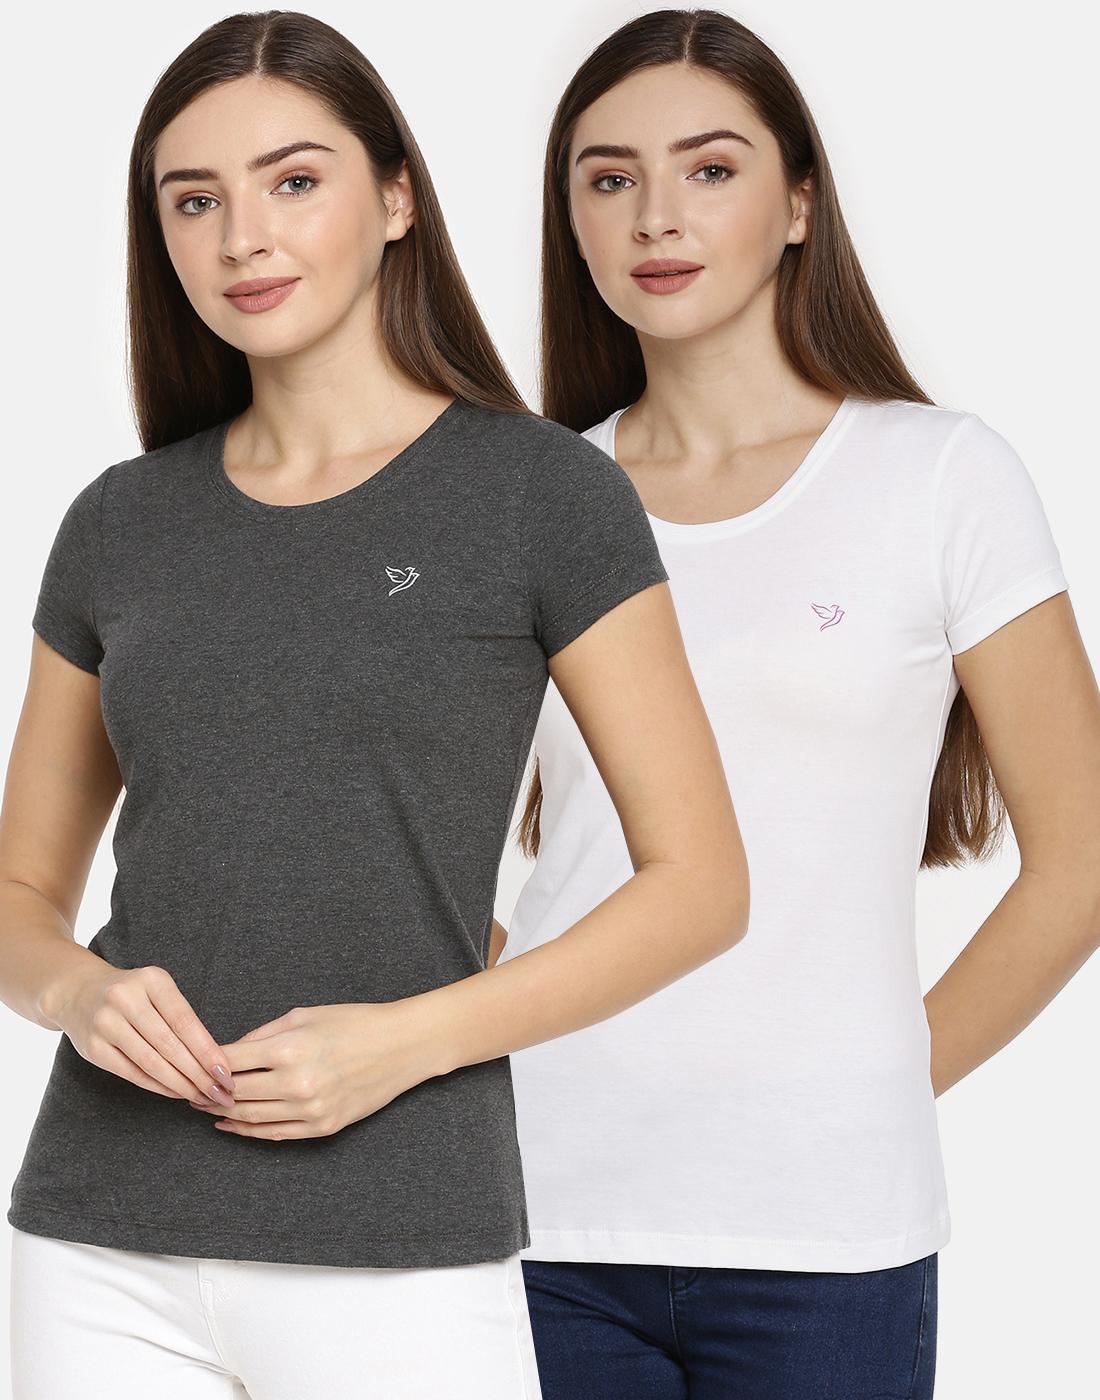 Twin Birds   Twinbirds Women Slim Fit Signature Tee - Combo Pack